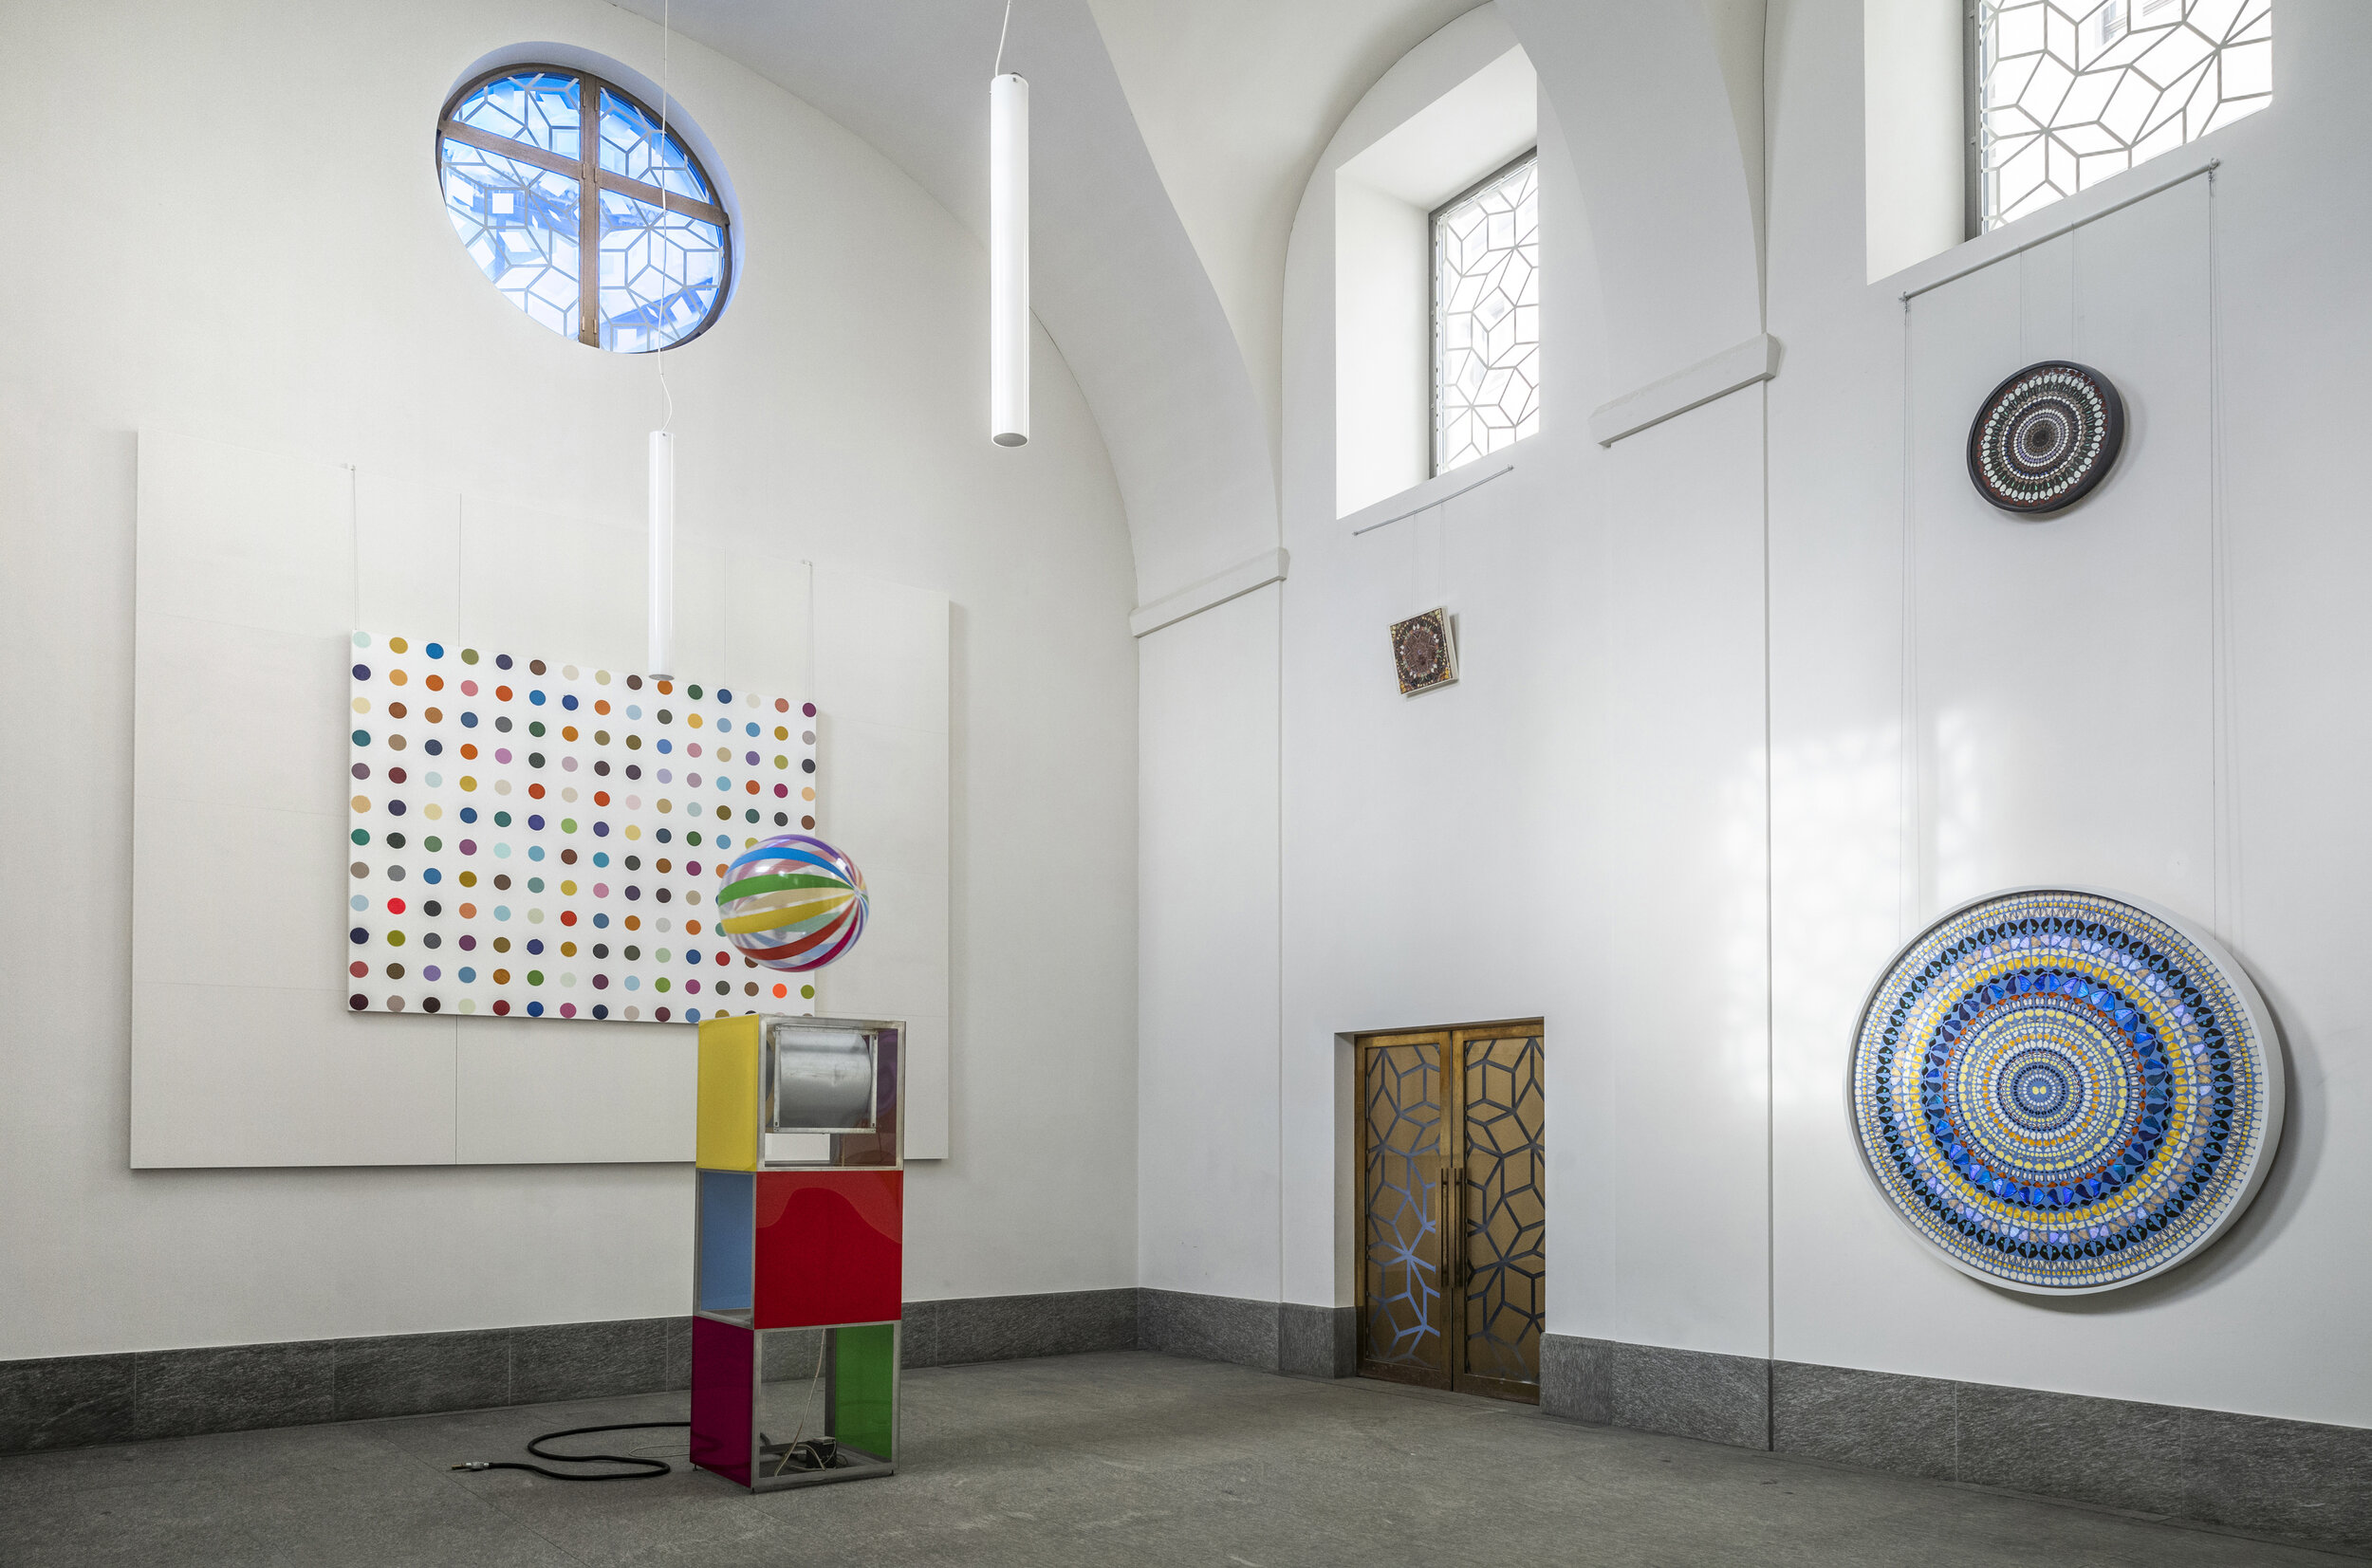 Damien Hirst, Protestant Church, St. Moritz Dorf, 2021, St Moritz (2)